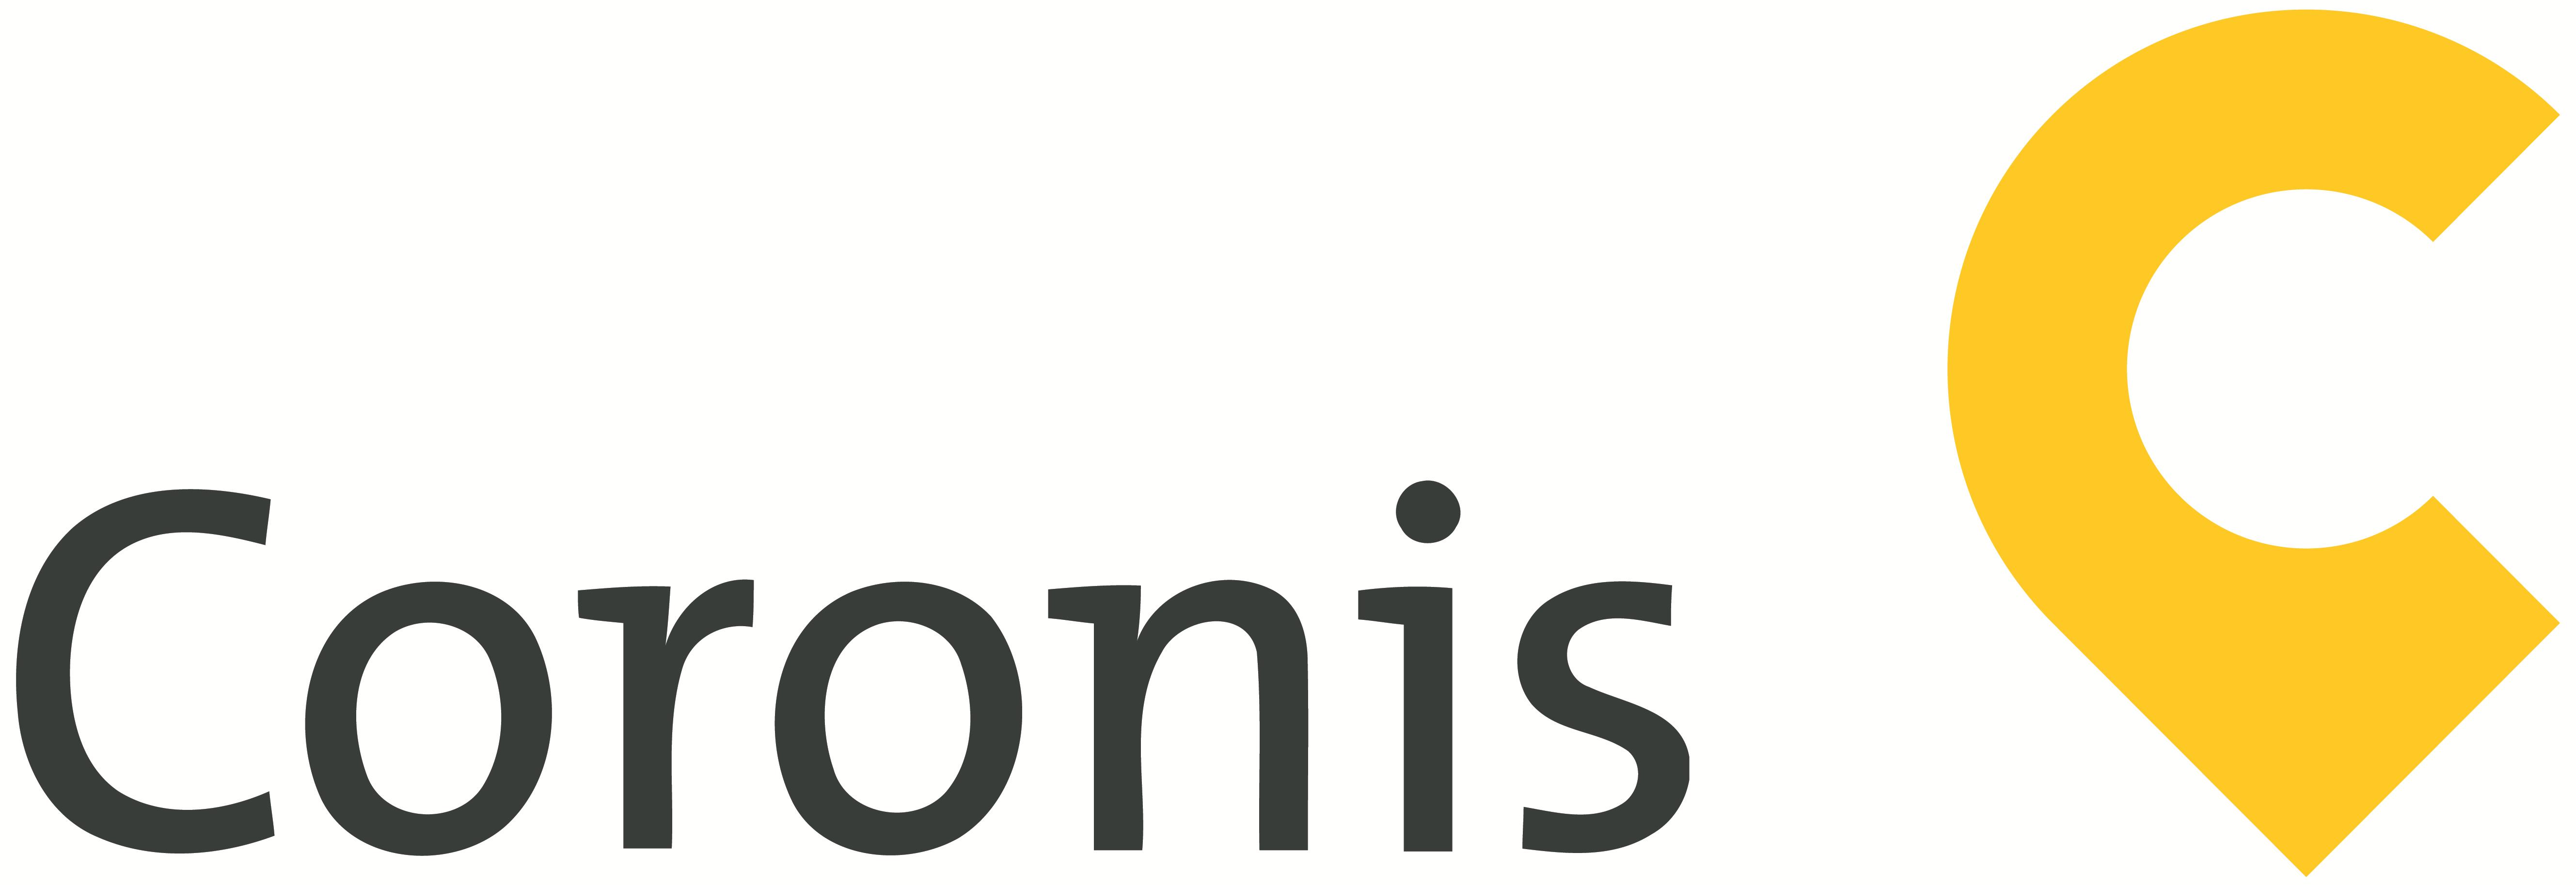 Coronis Realty, Warner, 4500